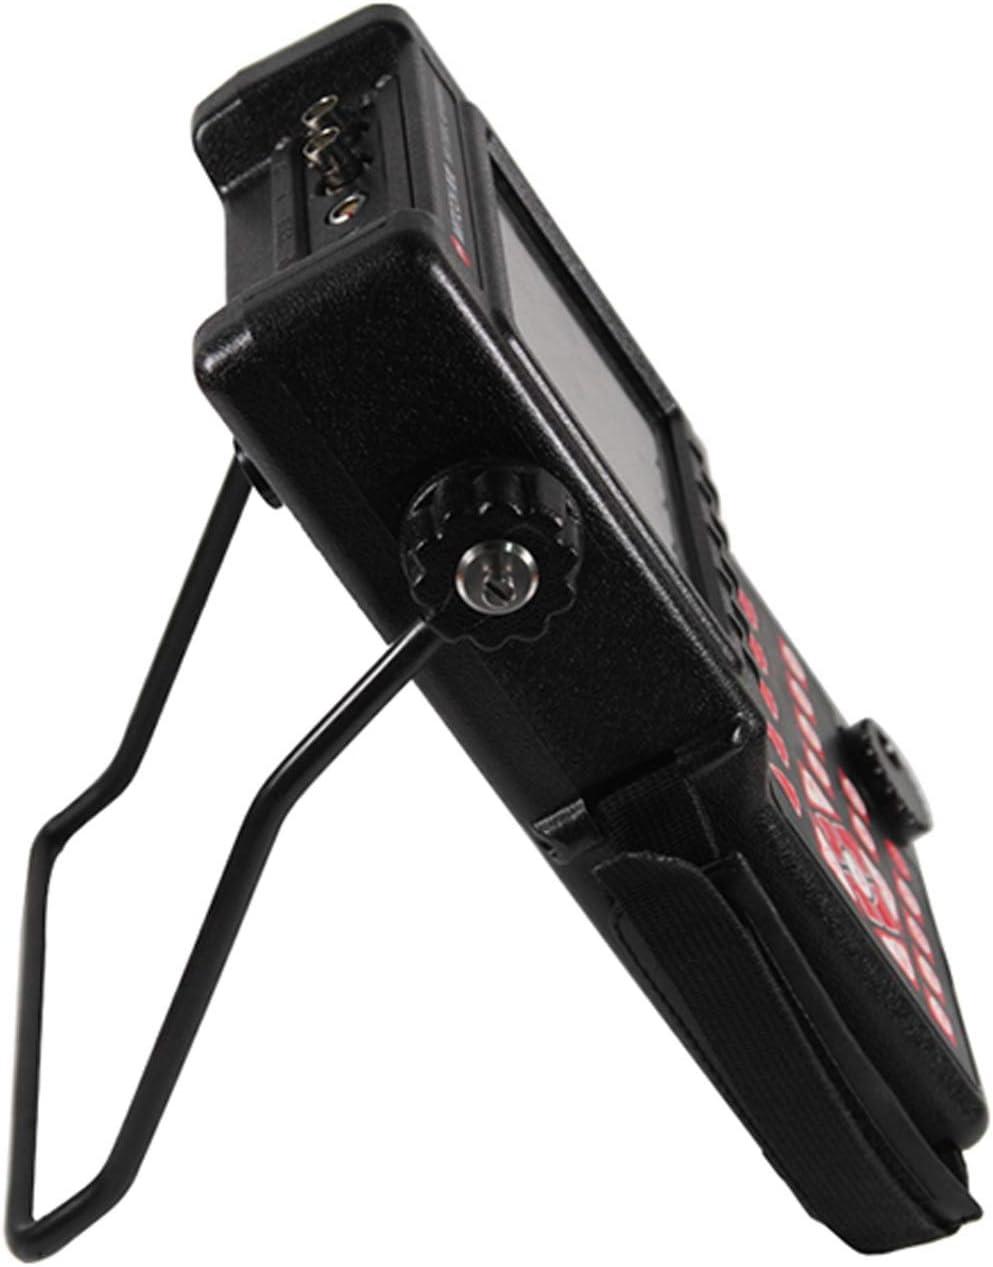 Portable instrument MFD620C Digital Ultrasonic Flaw Detector Ultrasound Leak Detector Ultrasound Flaw Detector